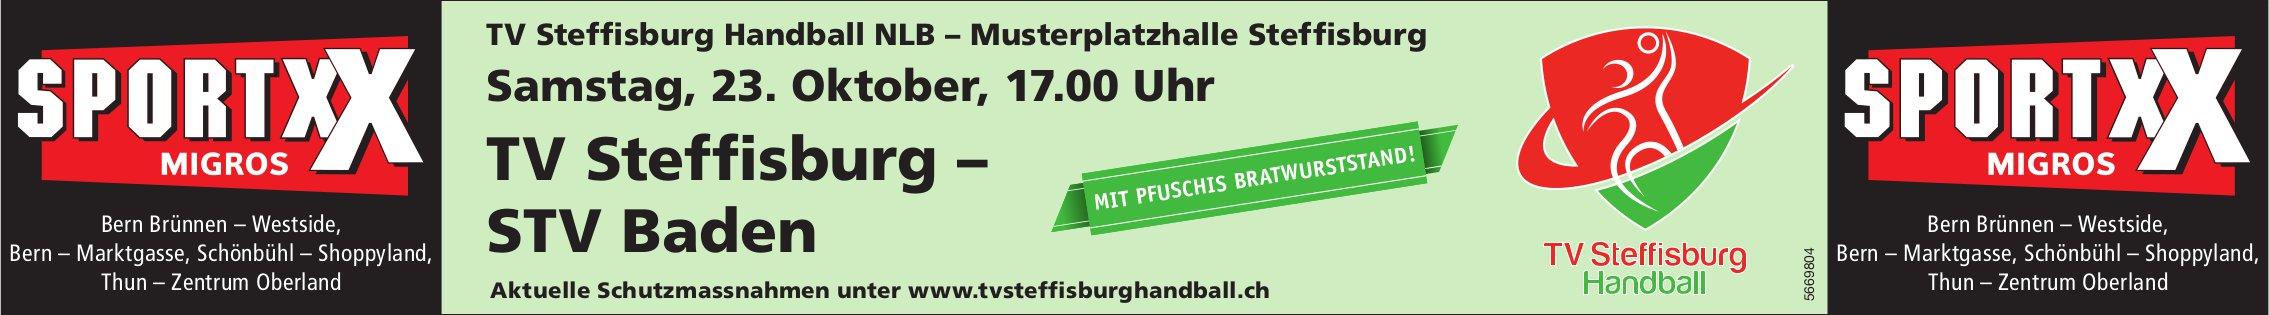 TV Steffisburg – STV Baden, 23. Oktober, TV Steffisburg Handball NLB